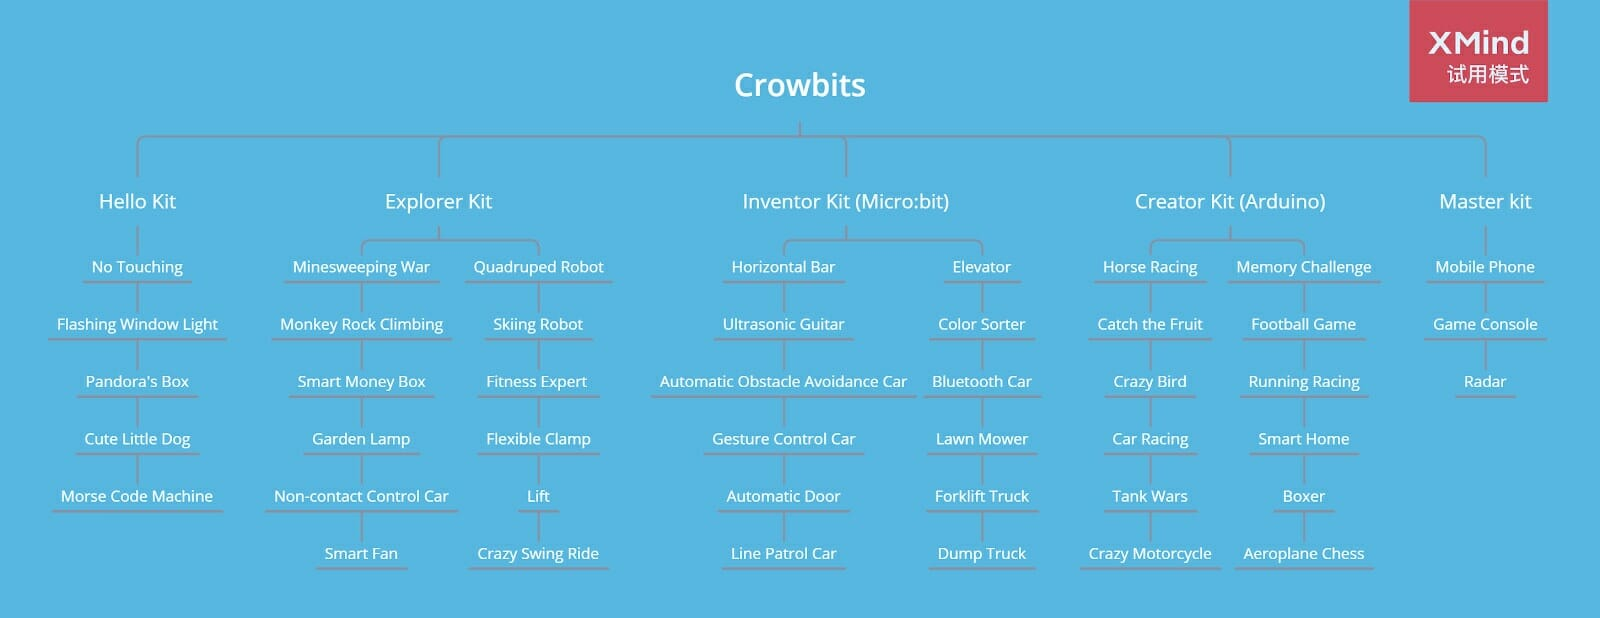 Crowbits Kits Content